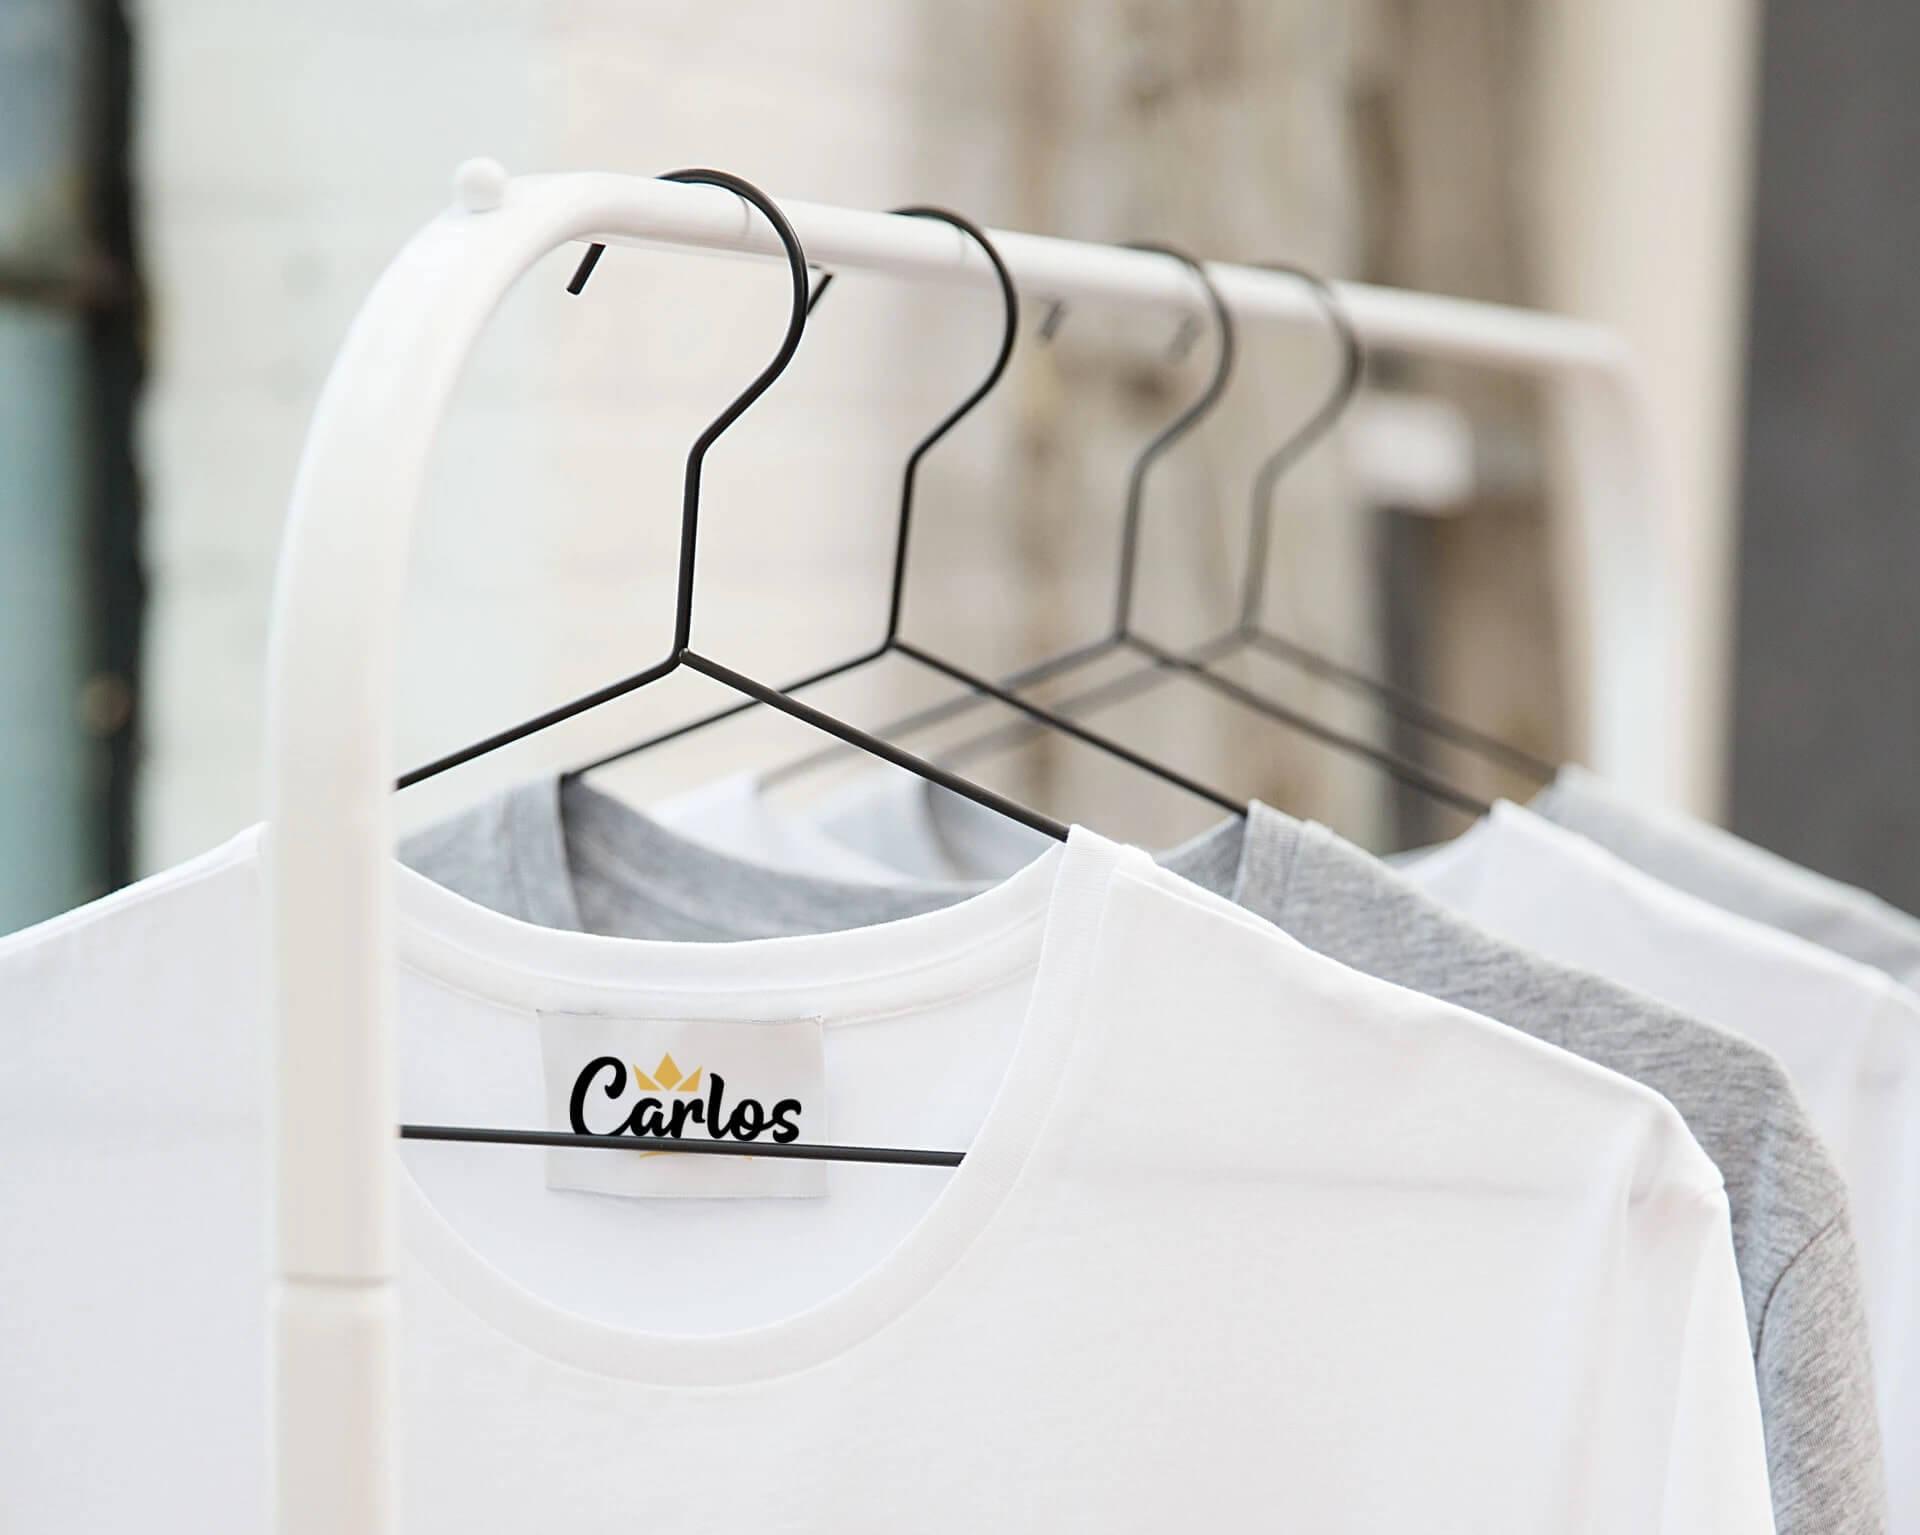 Carlos Tshirt Carlos Logo - The Logo Creative